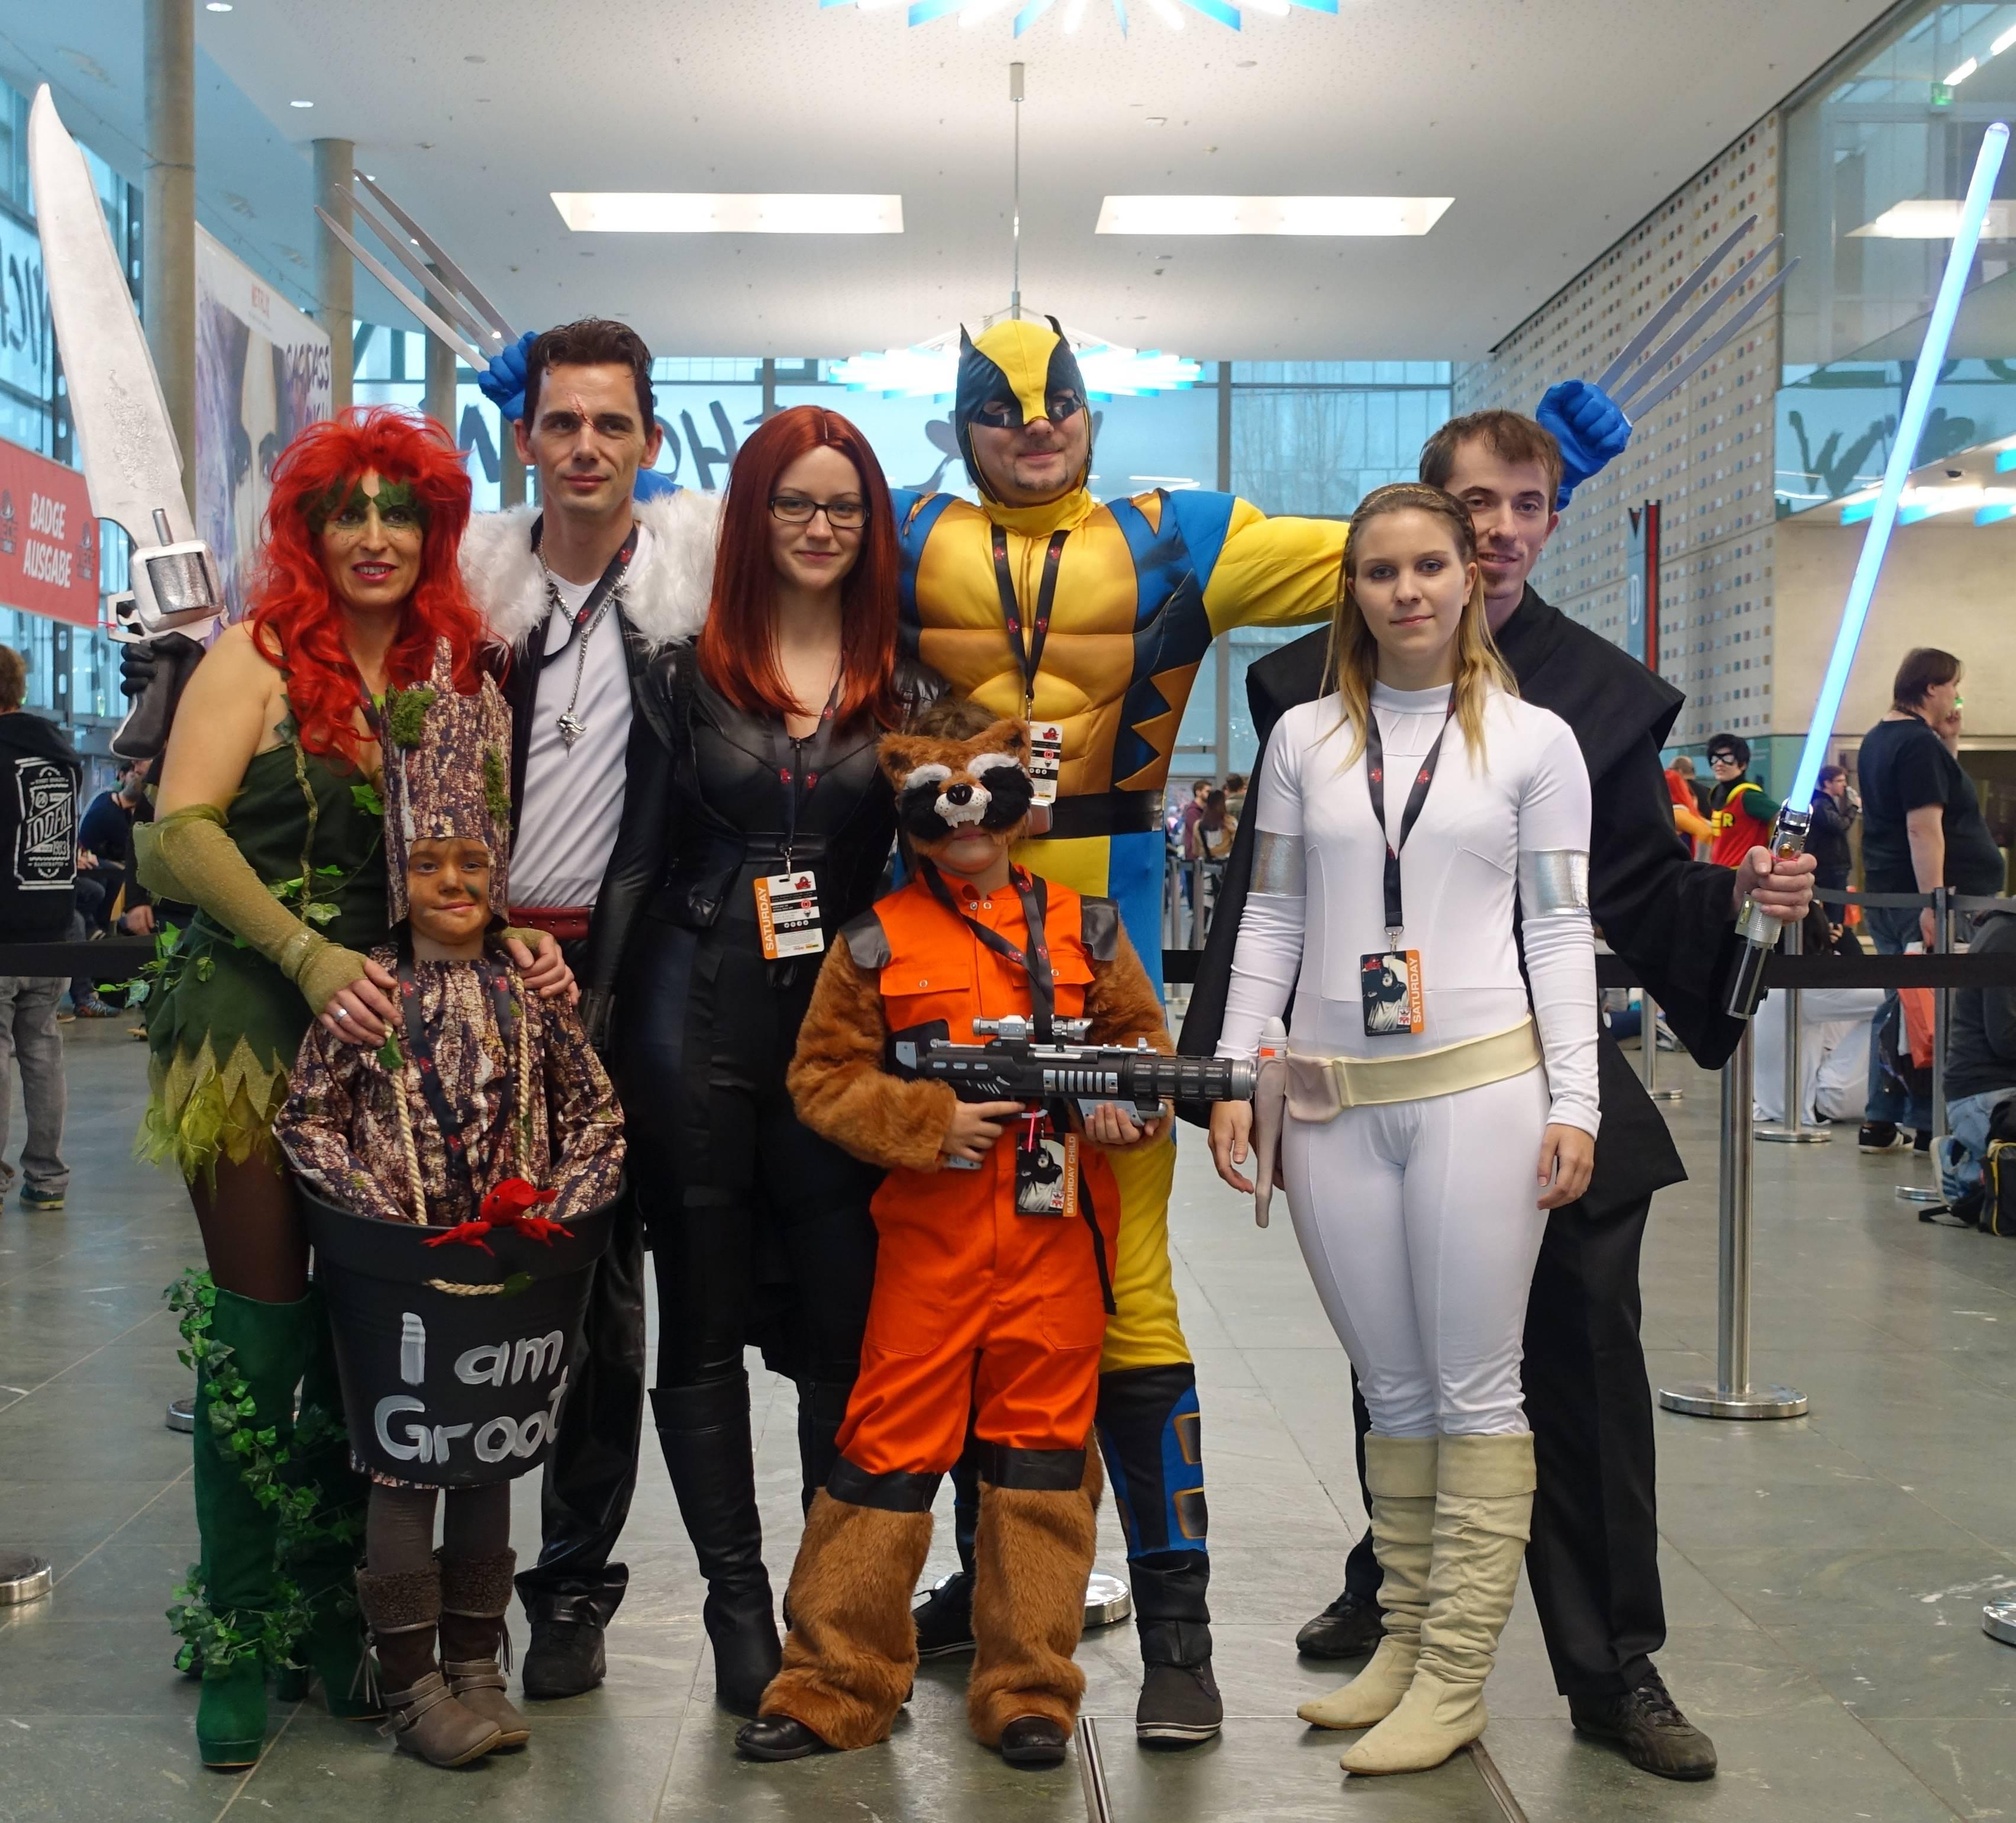 viecc, comic con, messe, cosplay